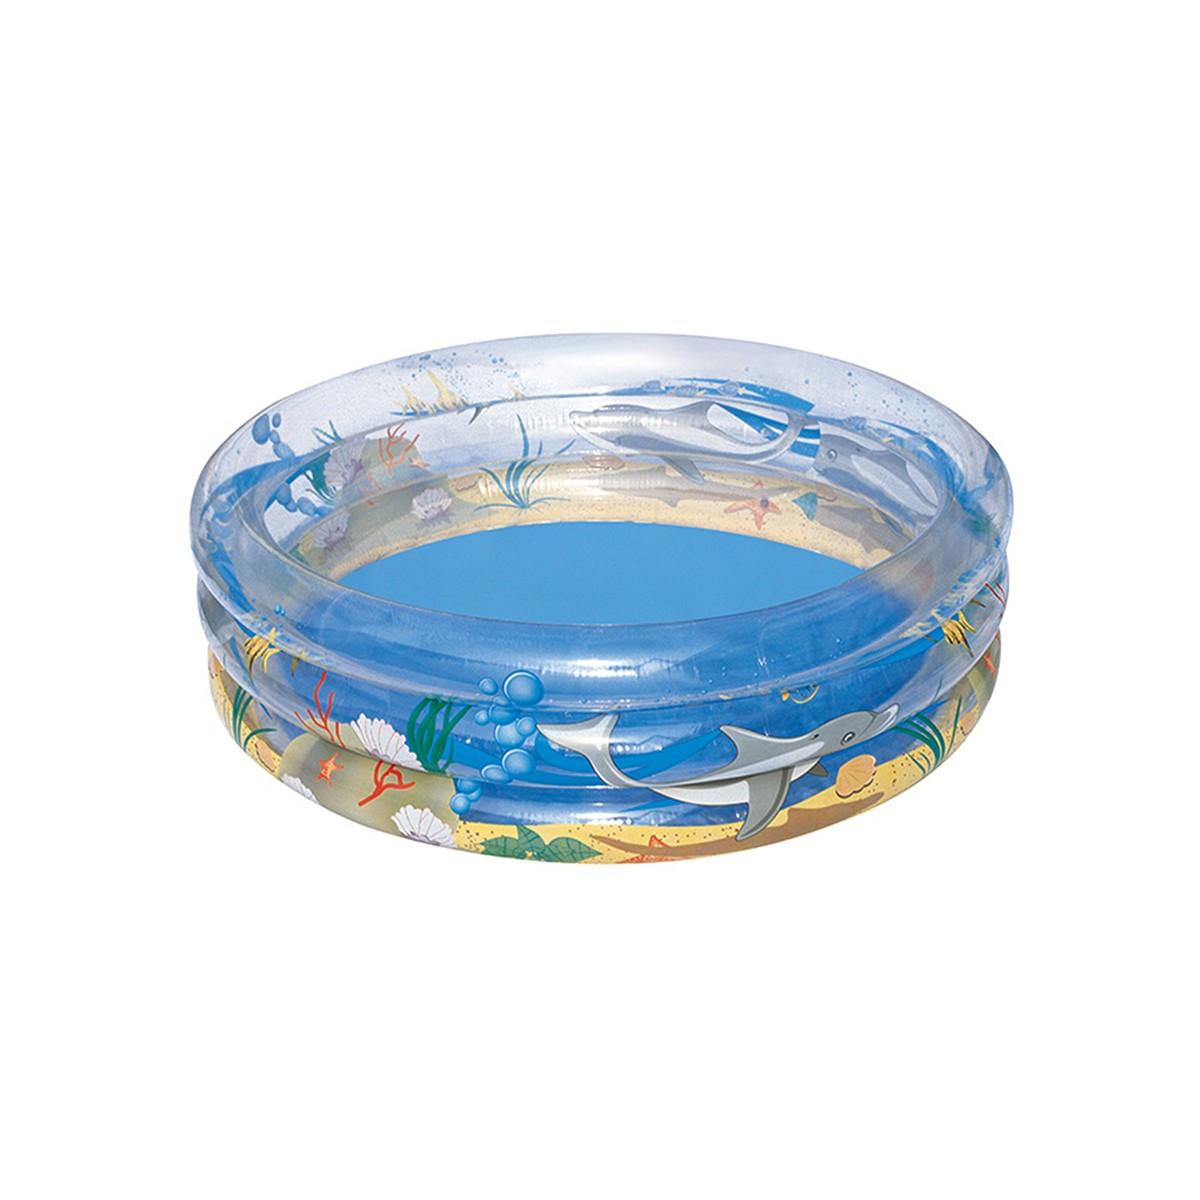 Bestway Piscina Sea Life Trasparente A 3 Anelli 150 Cm